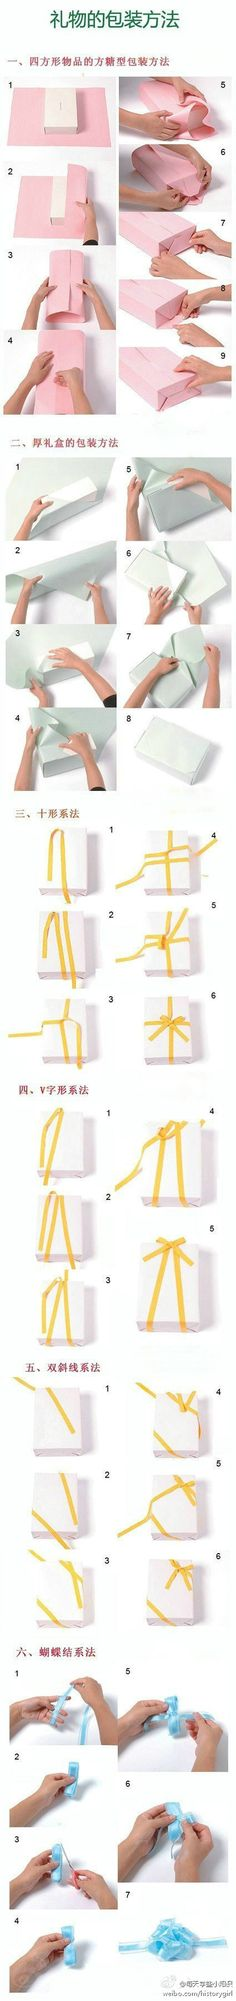 Regalo embalaje método Daquan